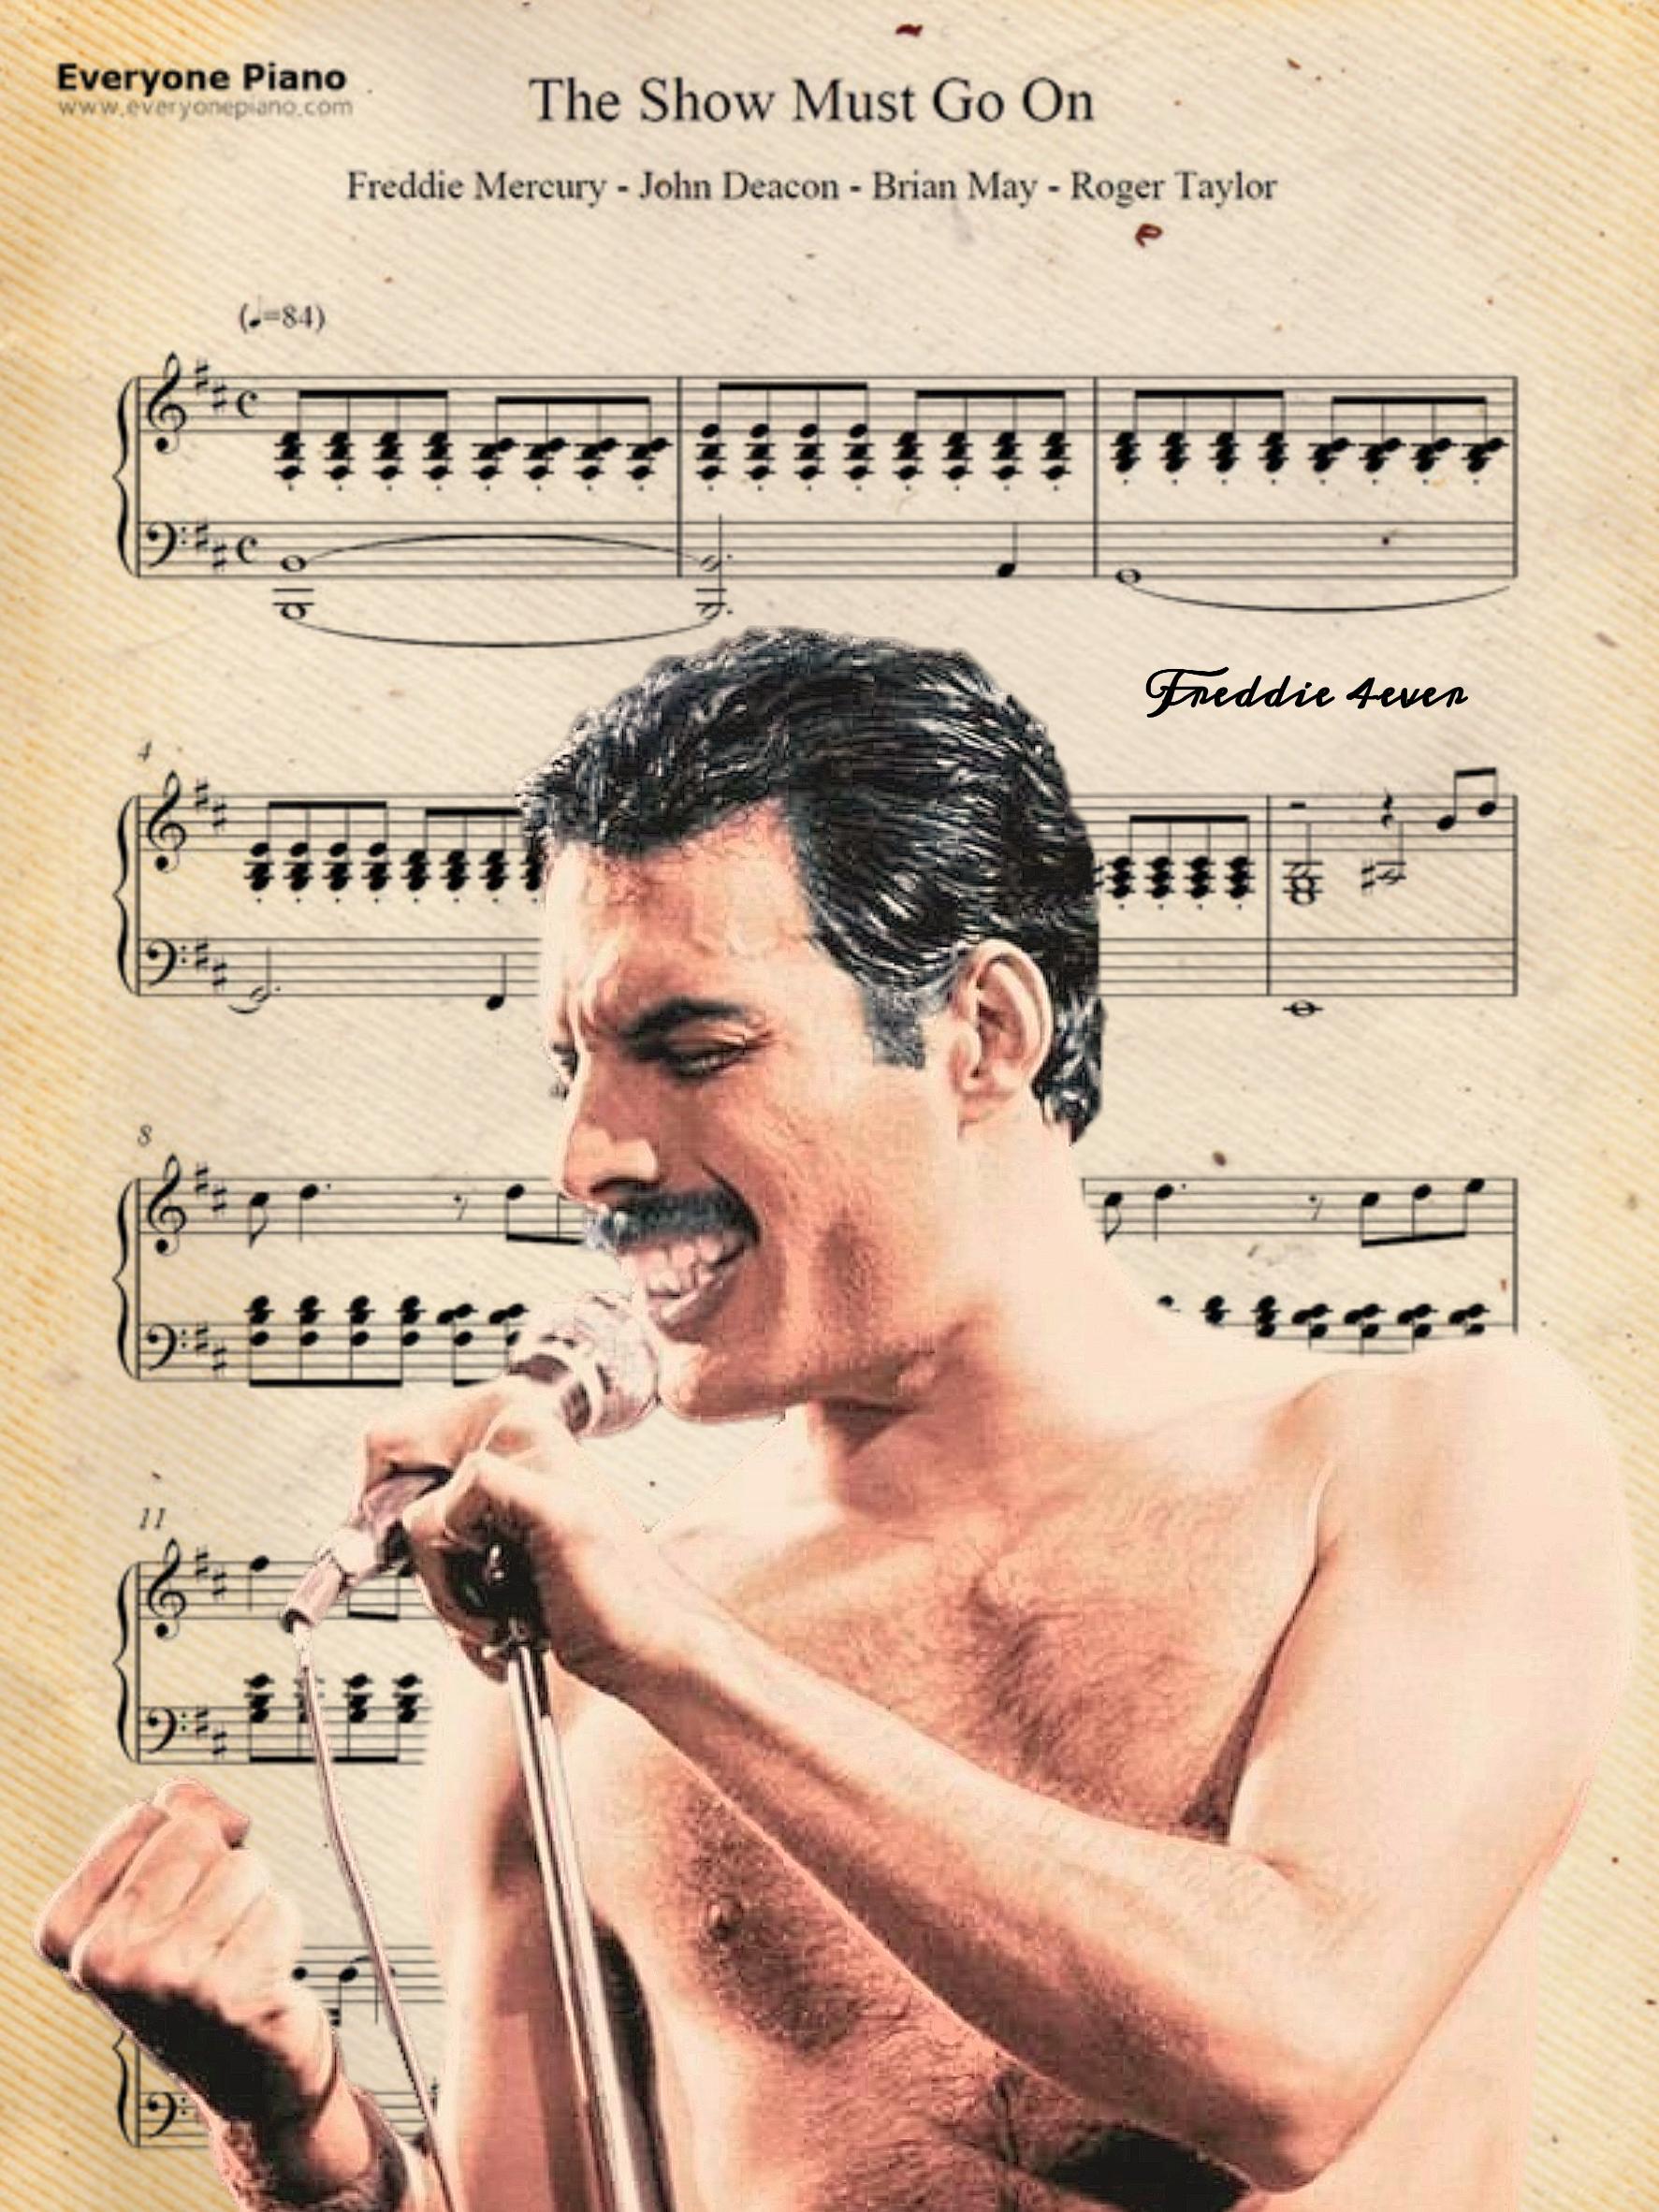 The Show Must Go On Freddie Mercury Queen Freddie Mercury Queen Aesthetic